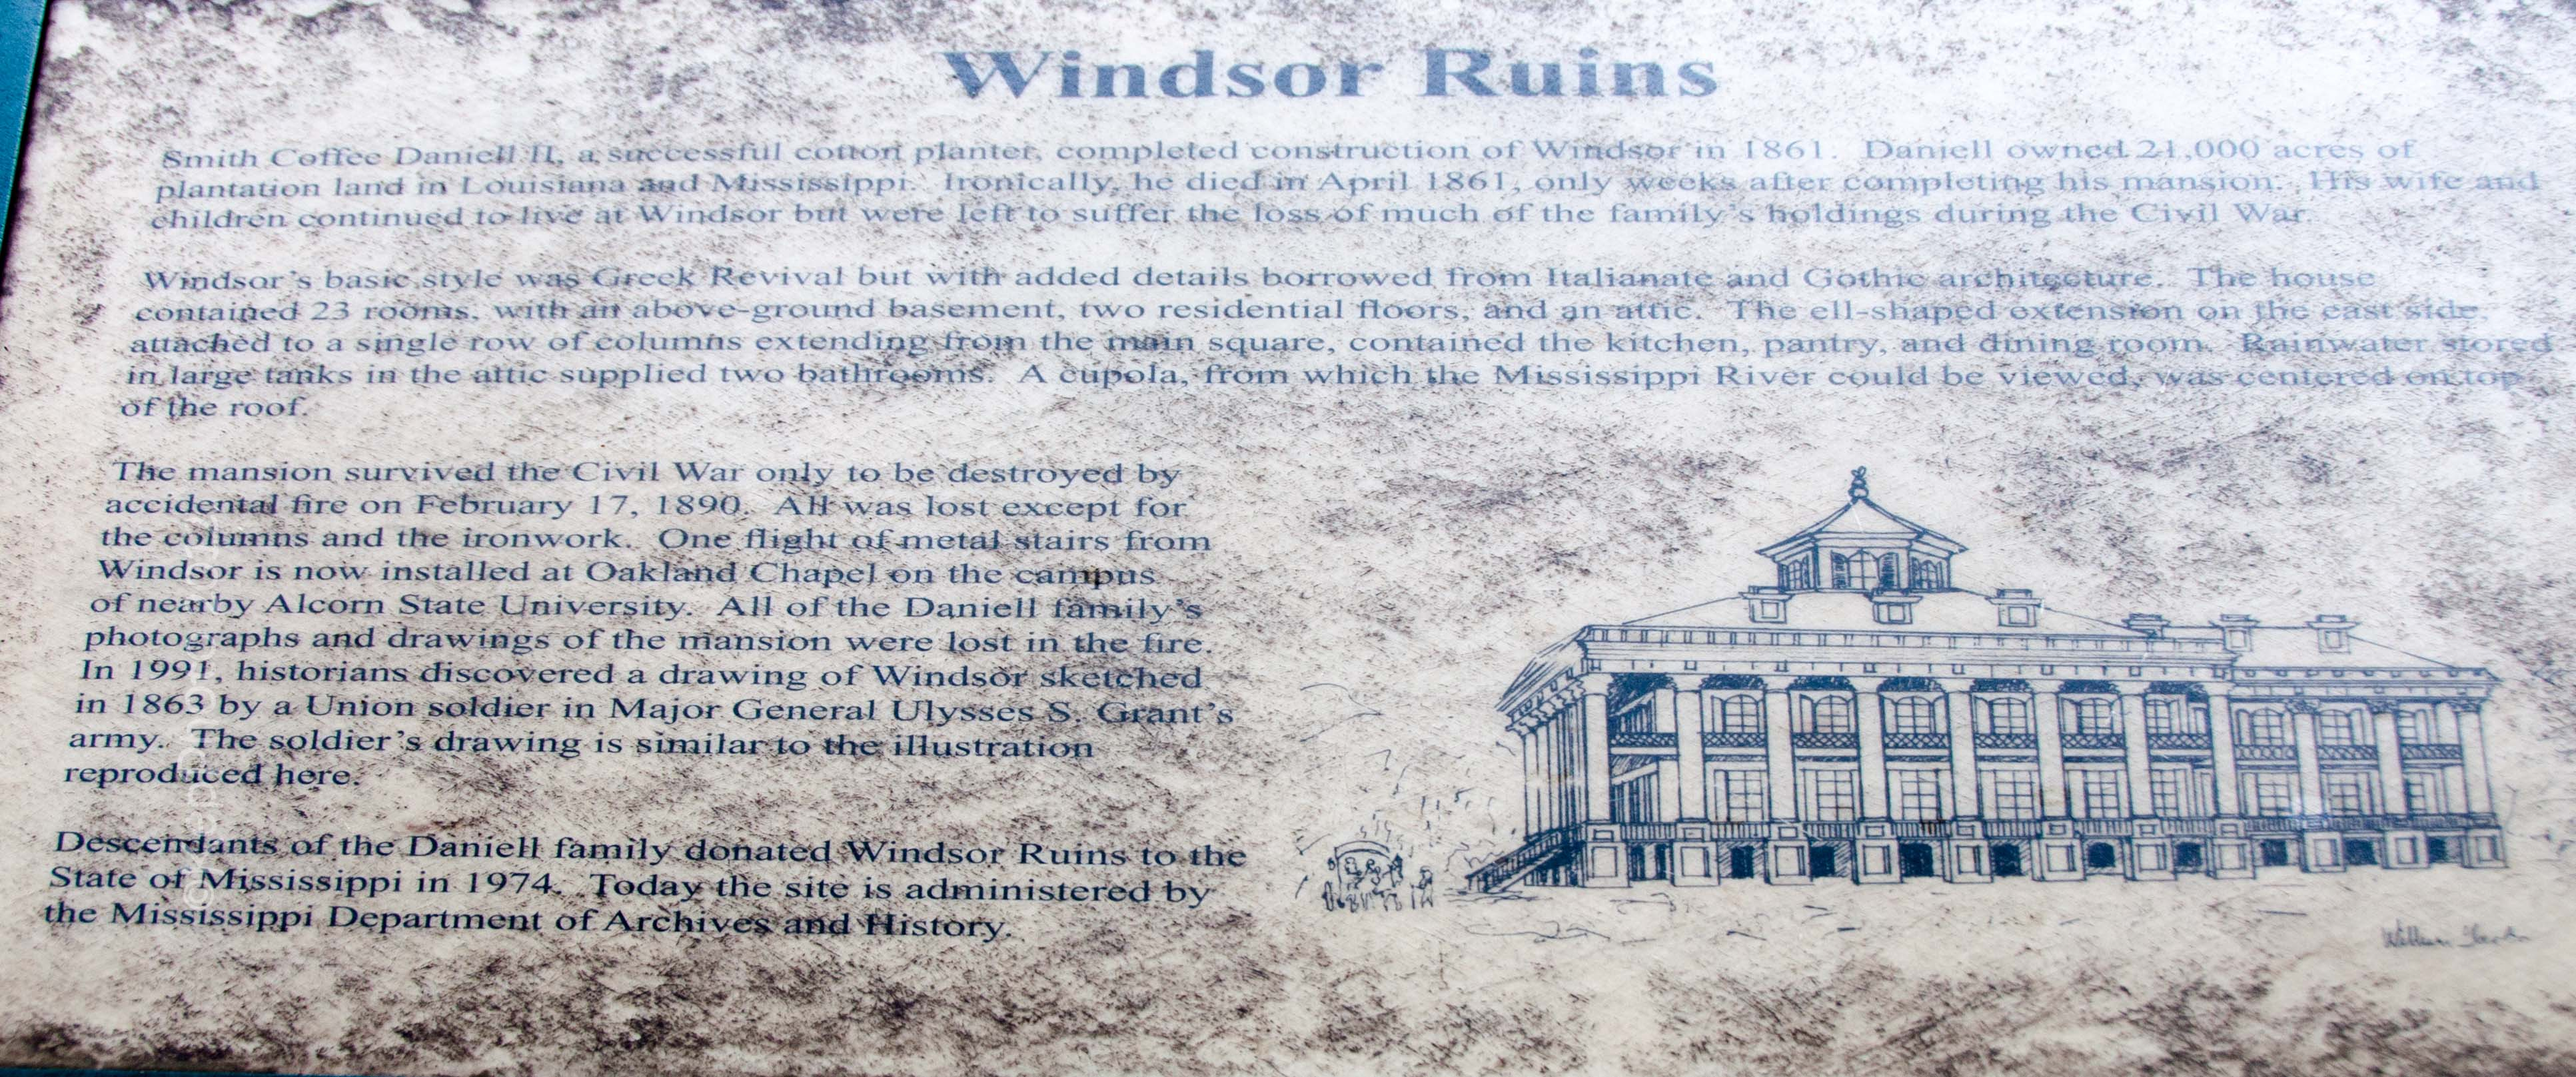 Windsor Ruins  2012 With The Flying SunCruiser